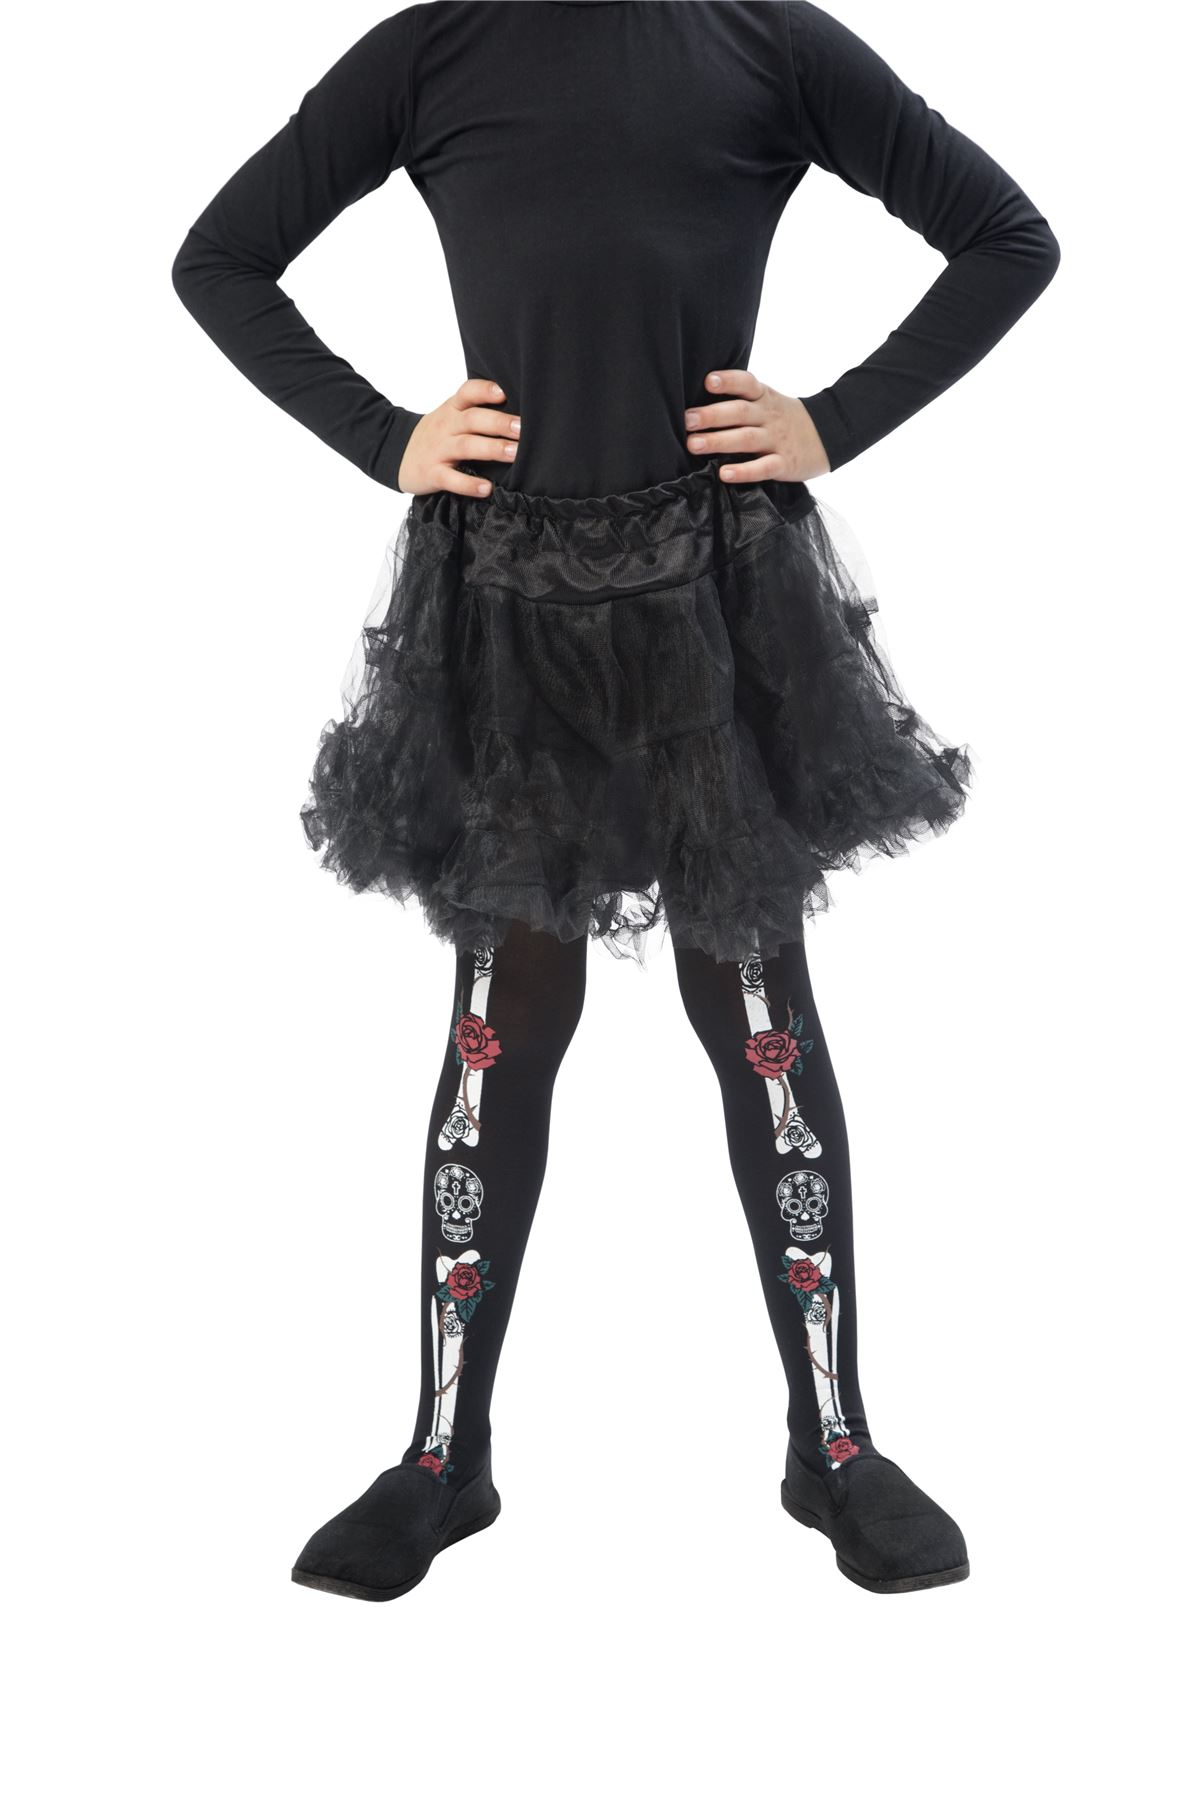 girls halloween tights fancy dress scary spooky childrens kids